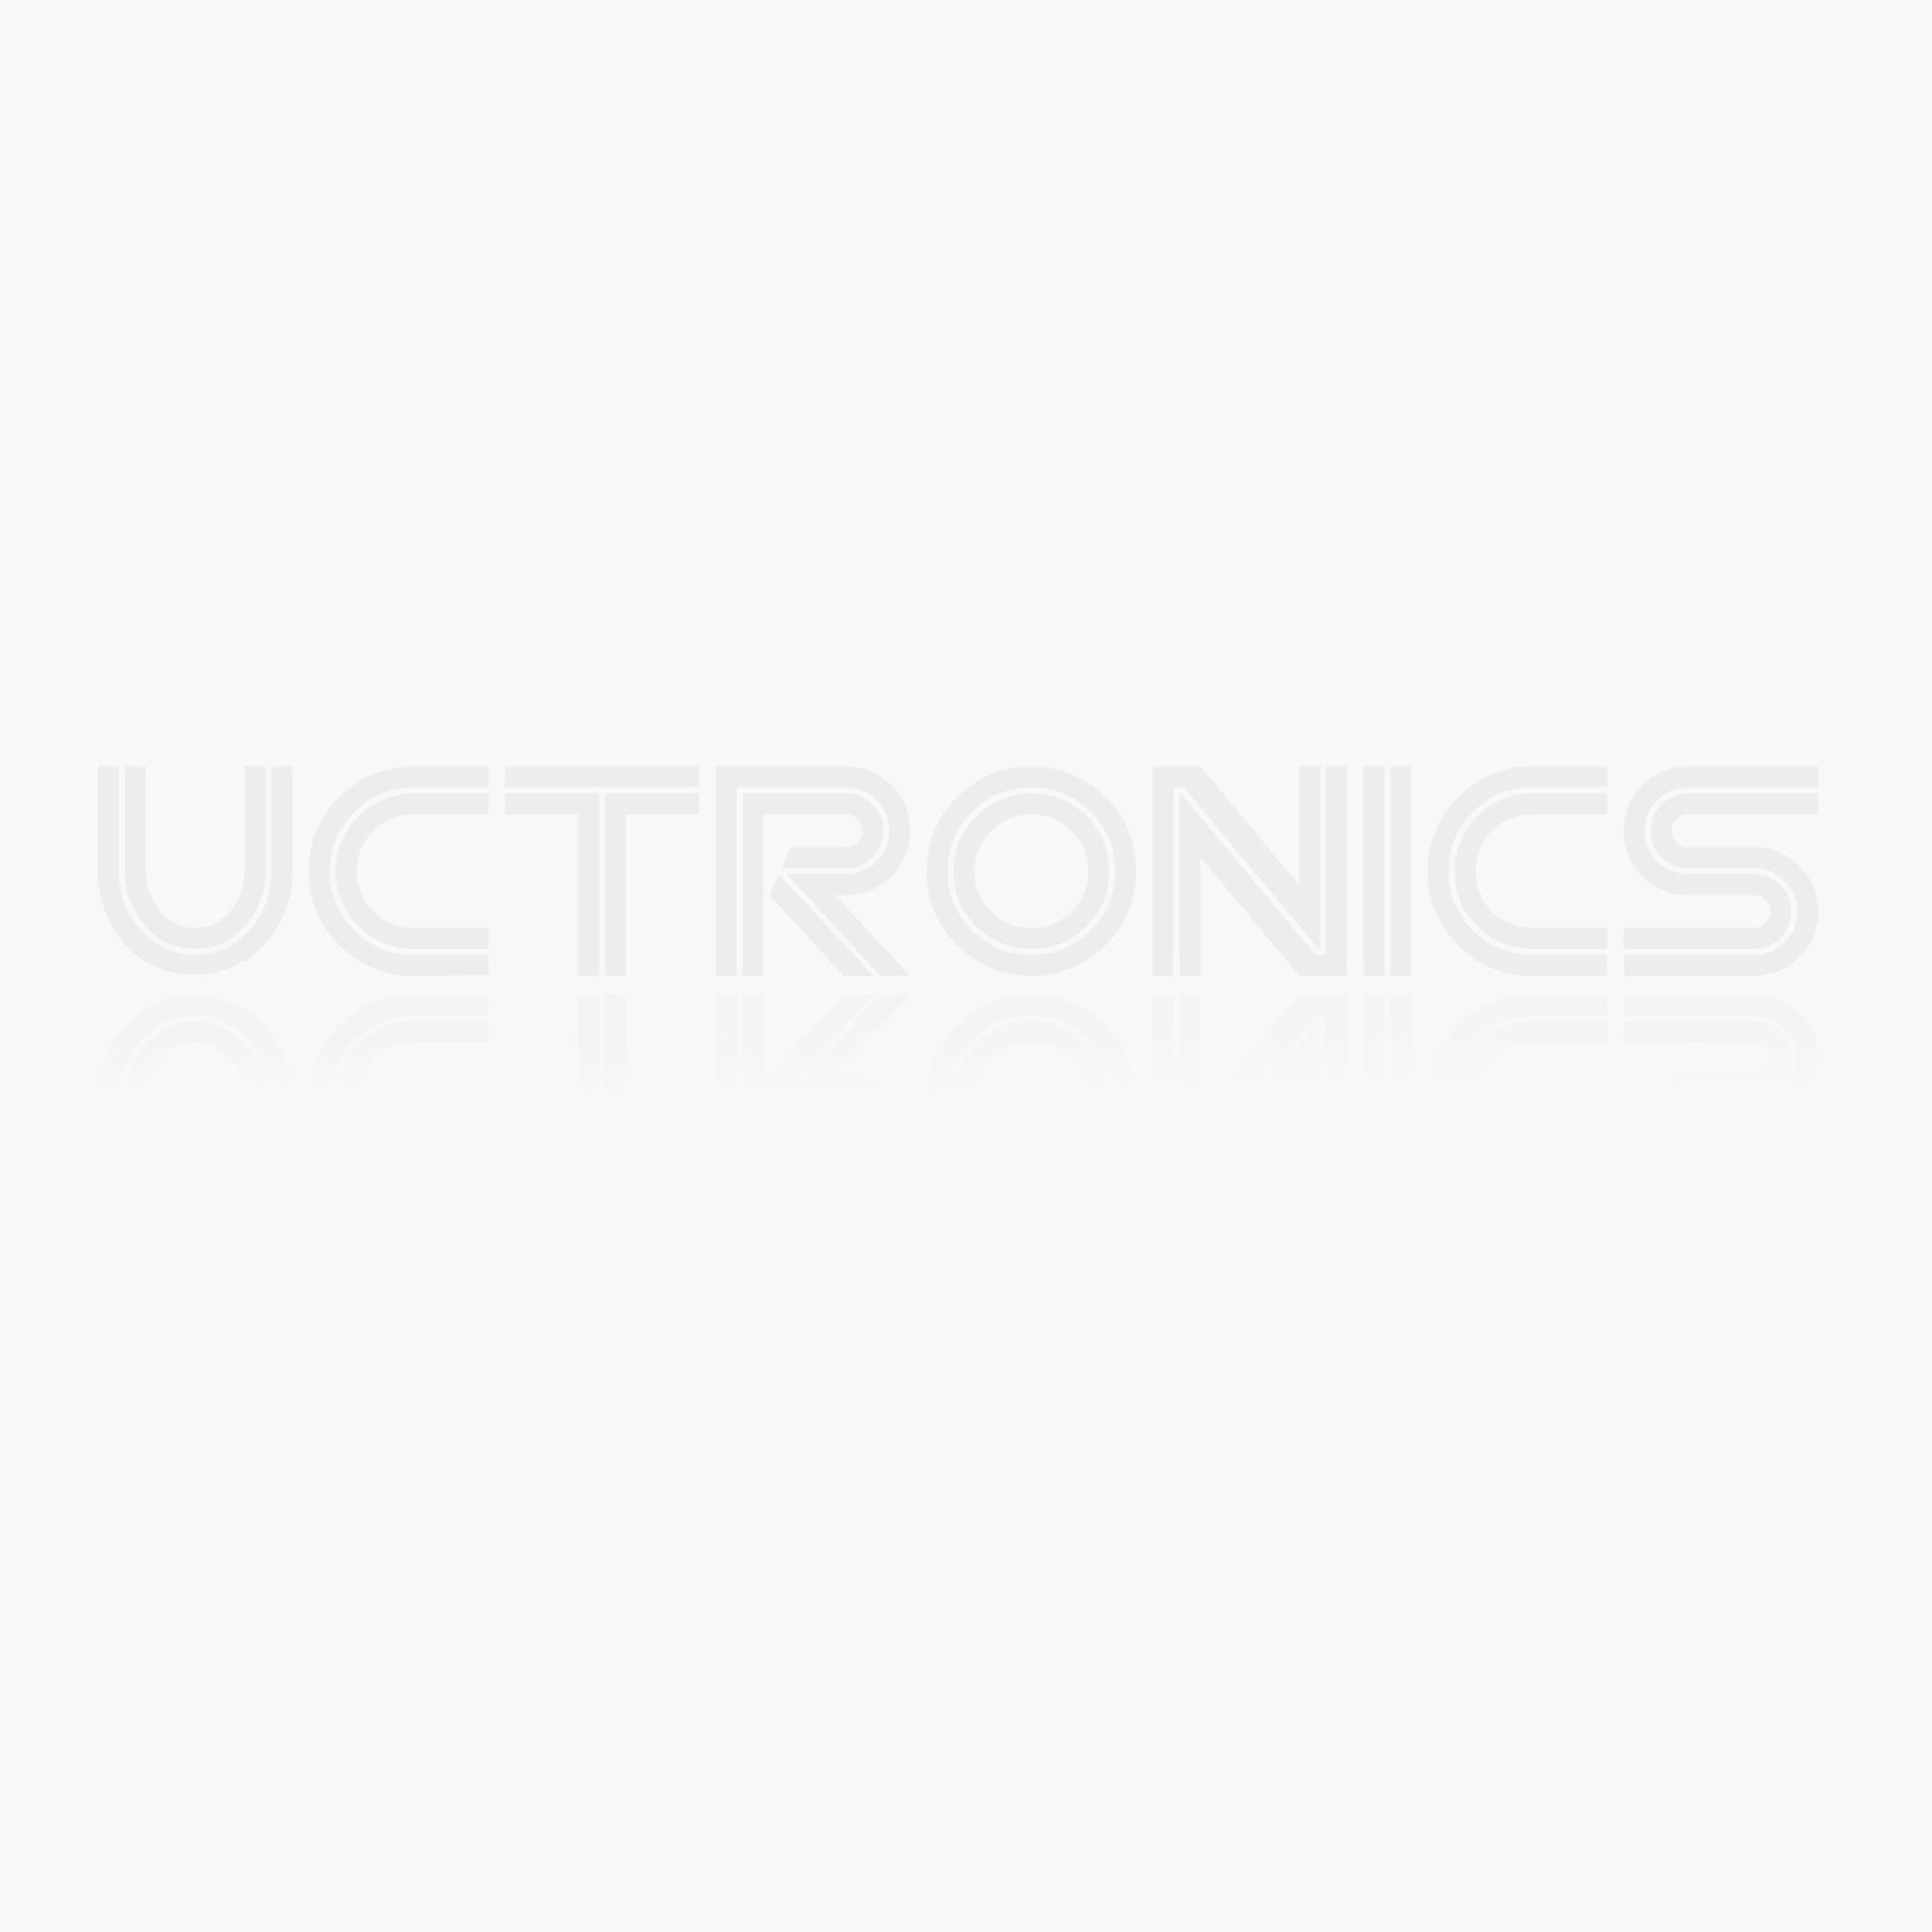 FL-2 50A/75mV Ammeter Shunt